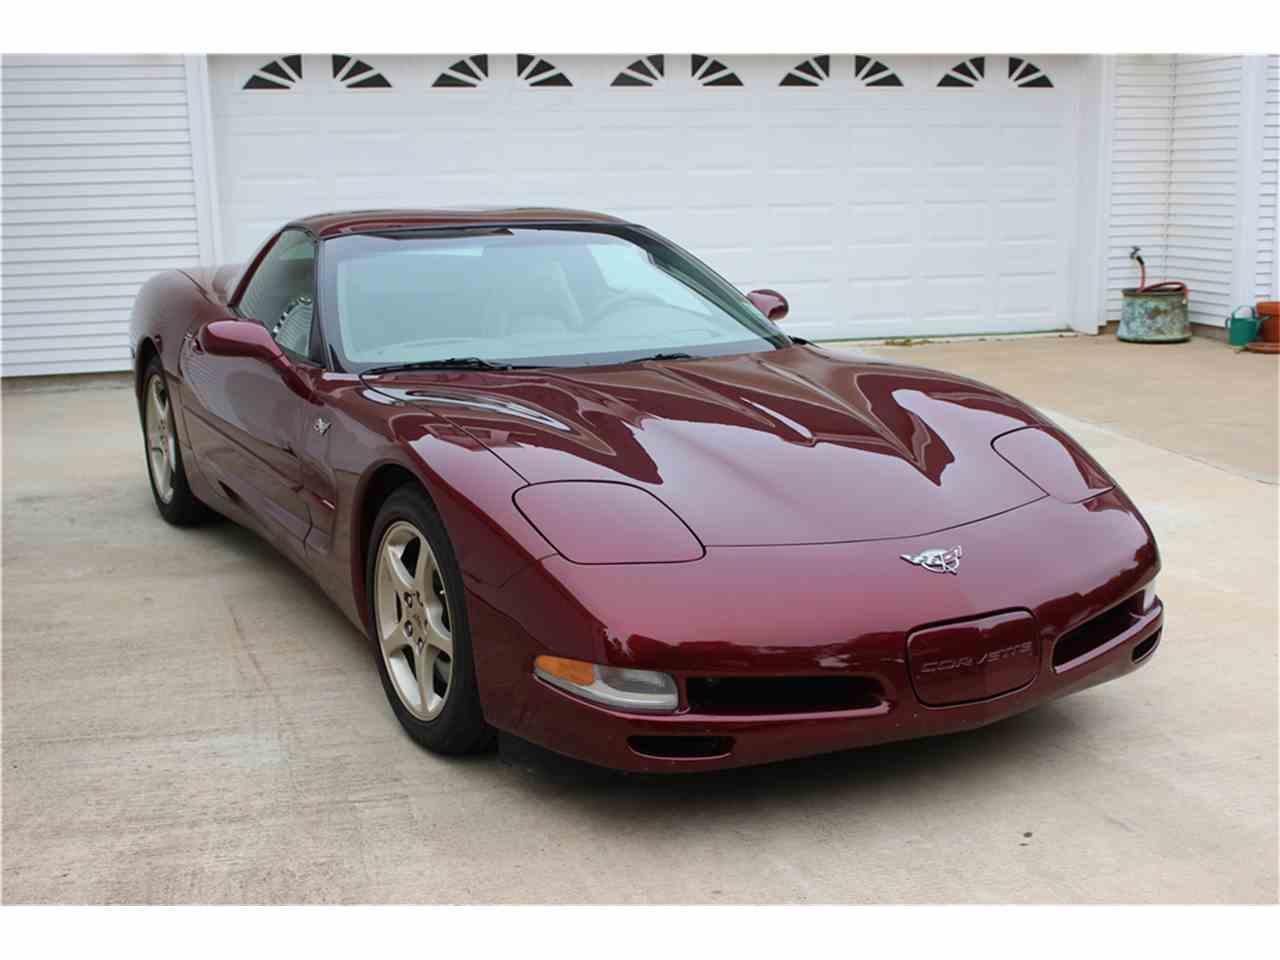 Corvette chevy corvette 2003 : 2003 Chevrolet Corvette for Sale | ClassicCars.com | CC-1053374